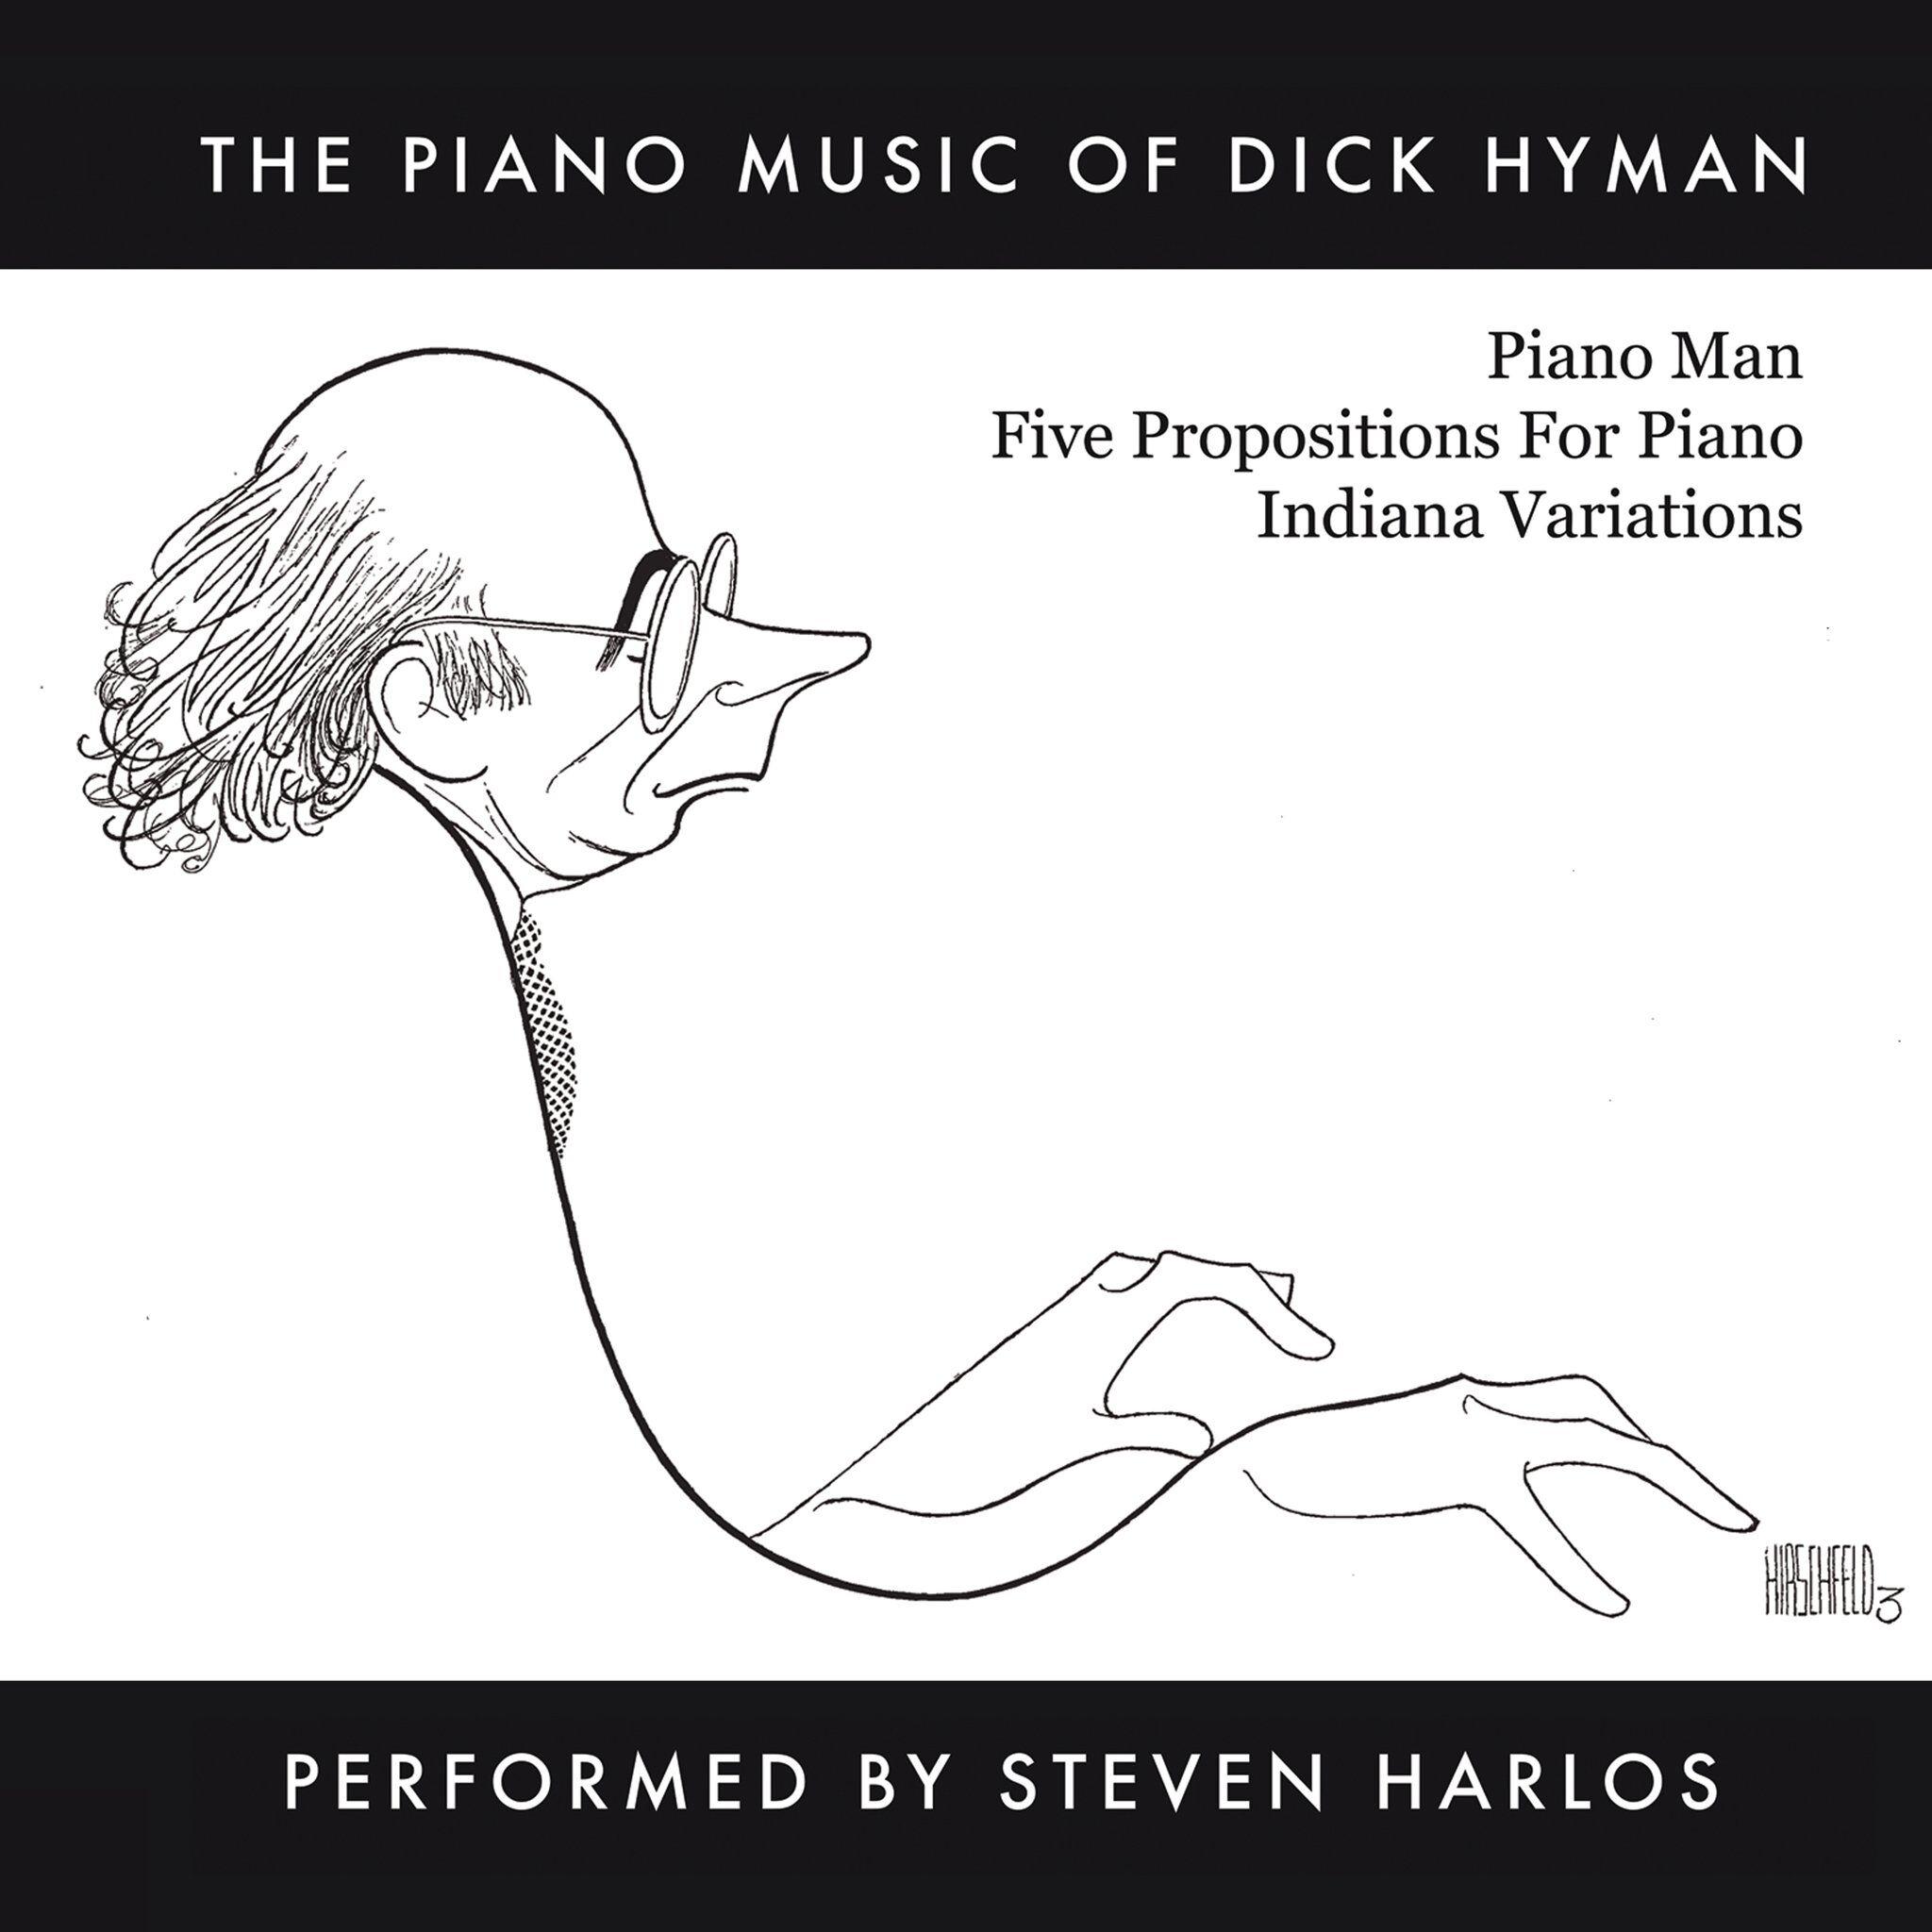 The Piano Music Of Dick Hyman